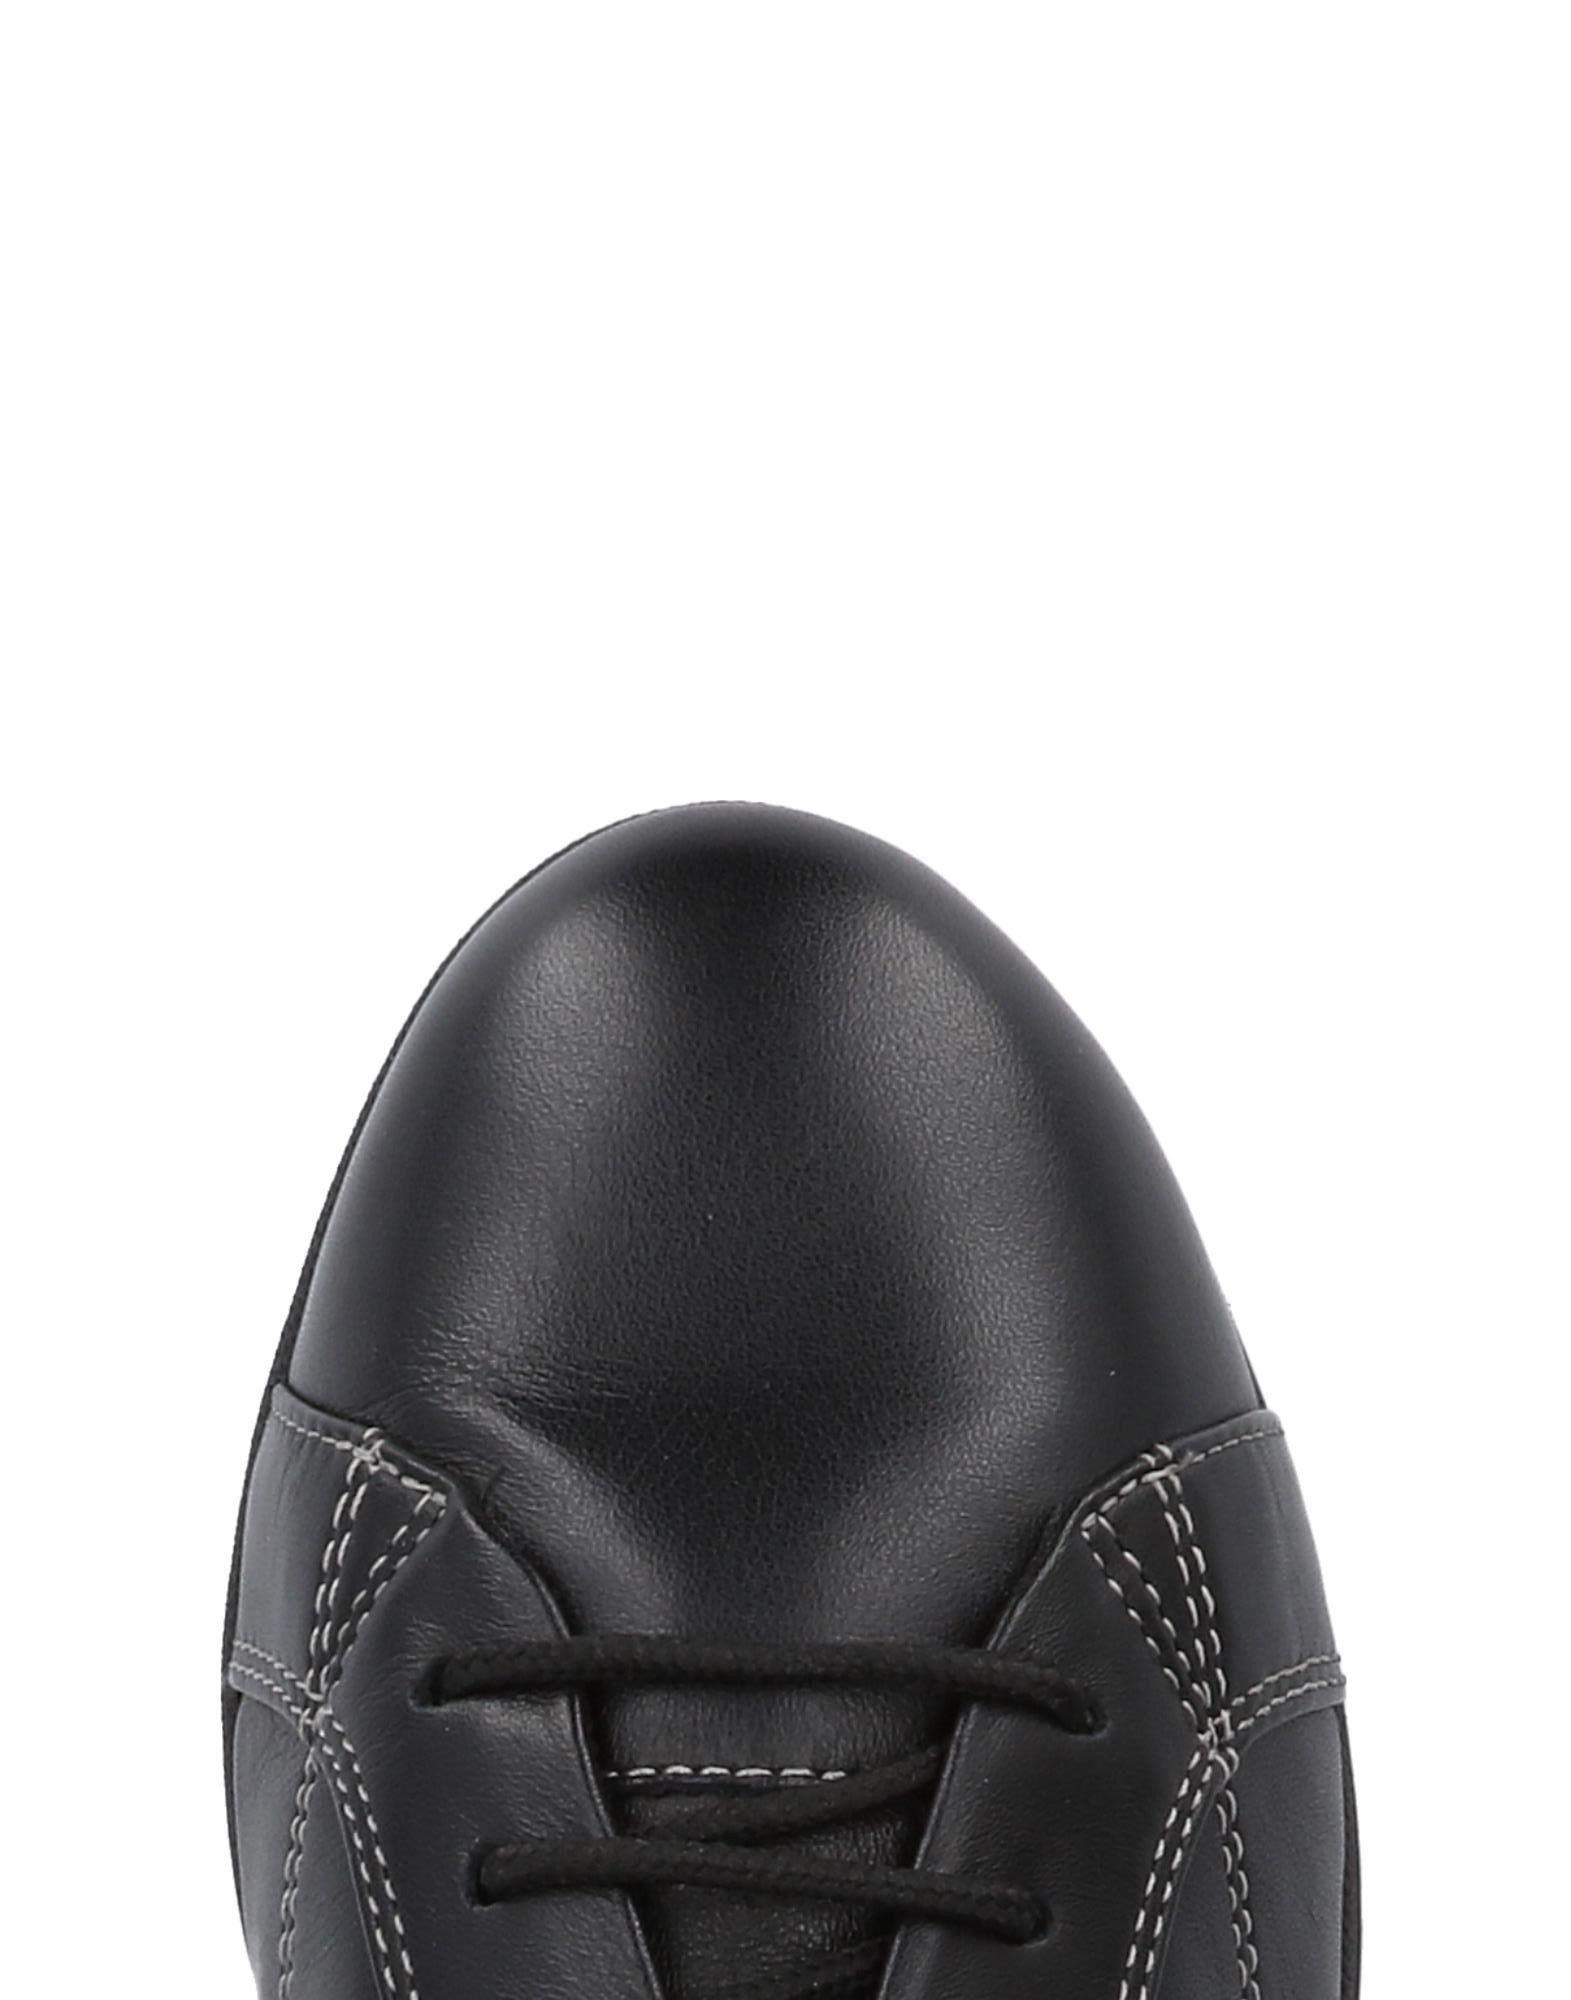 Geox Turnschuhes beliebte Damen 11465204LF Gute Qualität beliebte Turnschuhes Schuhe 148835